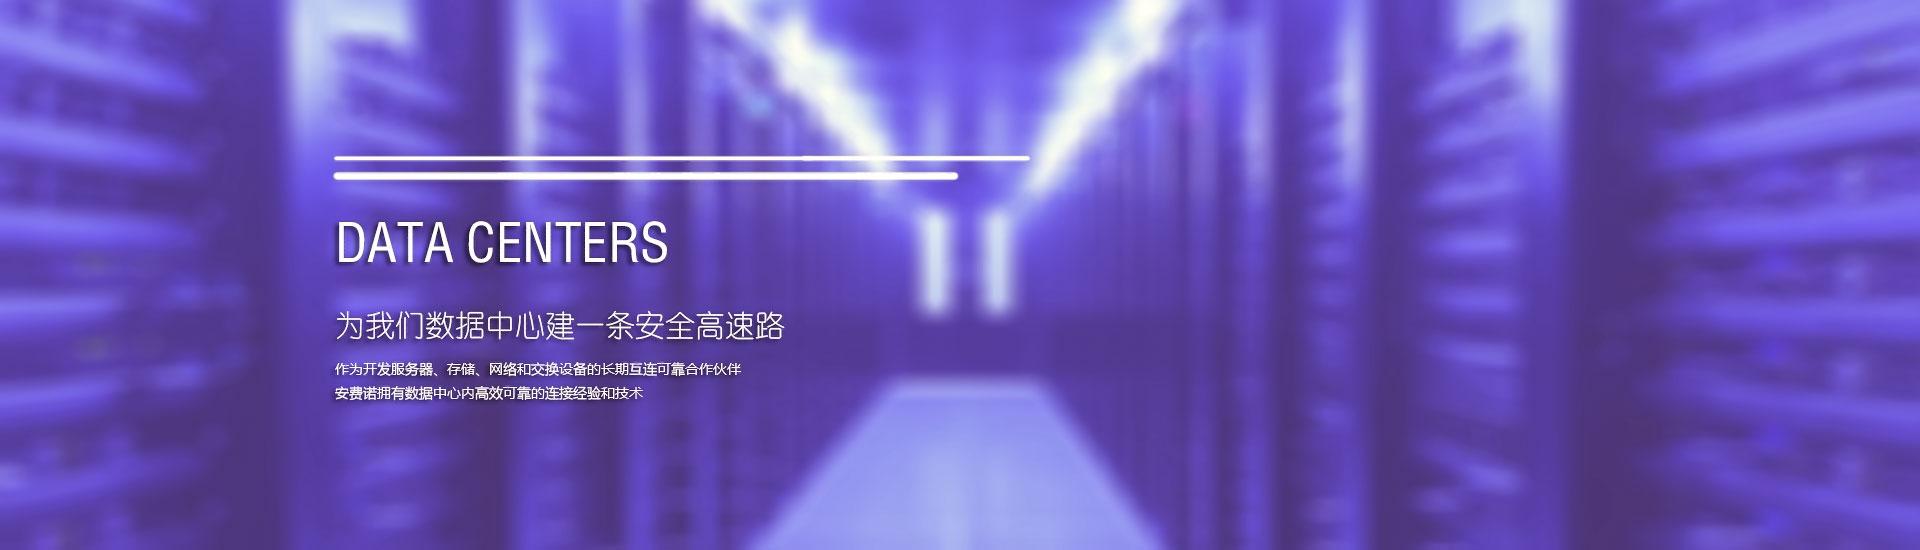 DM系统 香港免备案主机